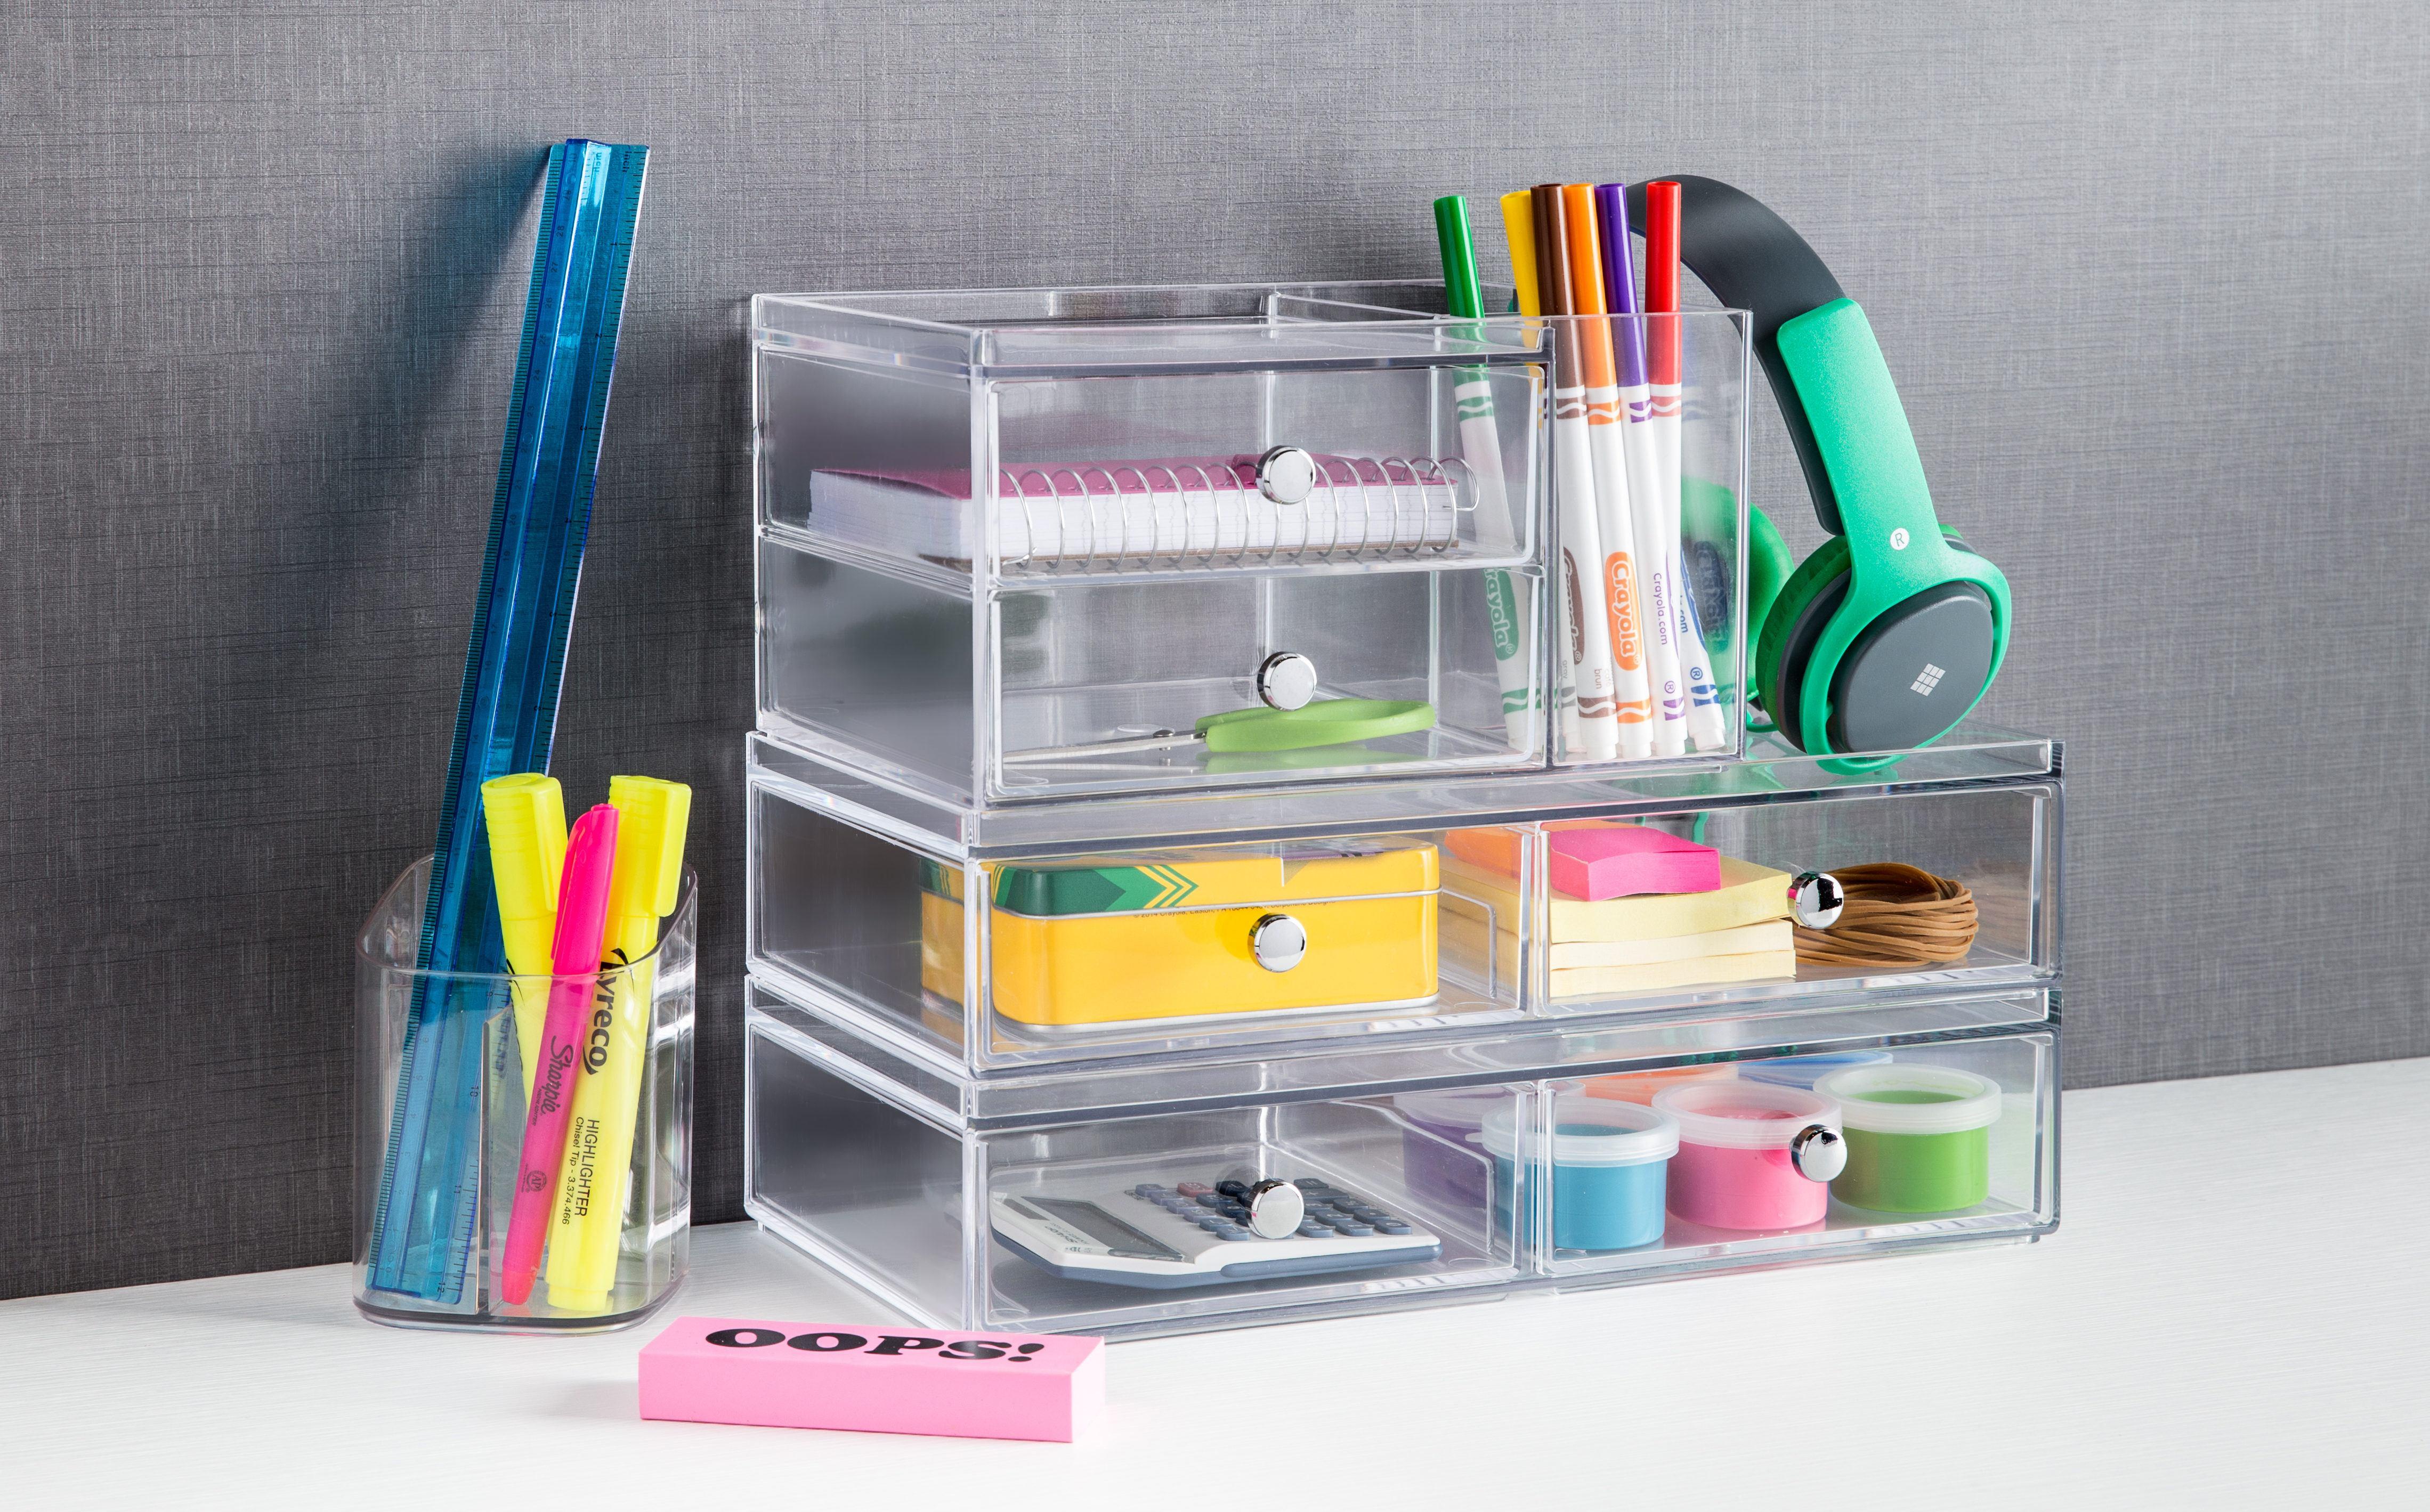 interdesign clarity back-to-school organizer